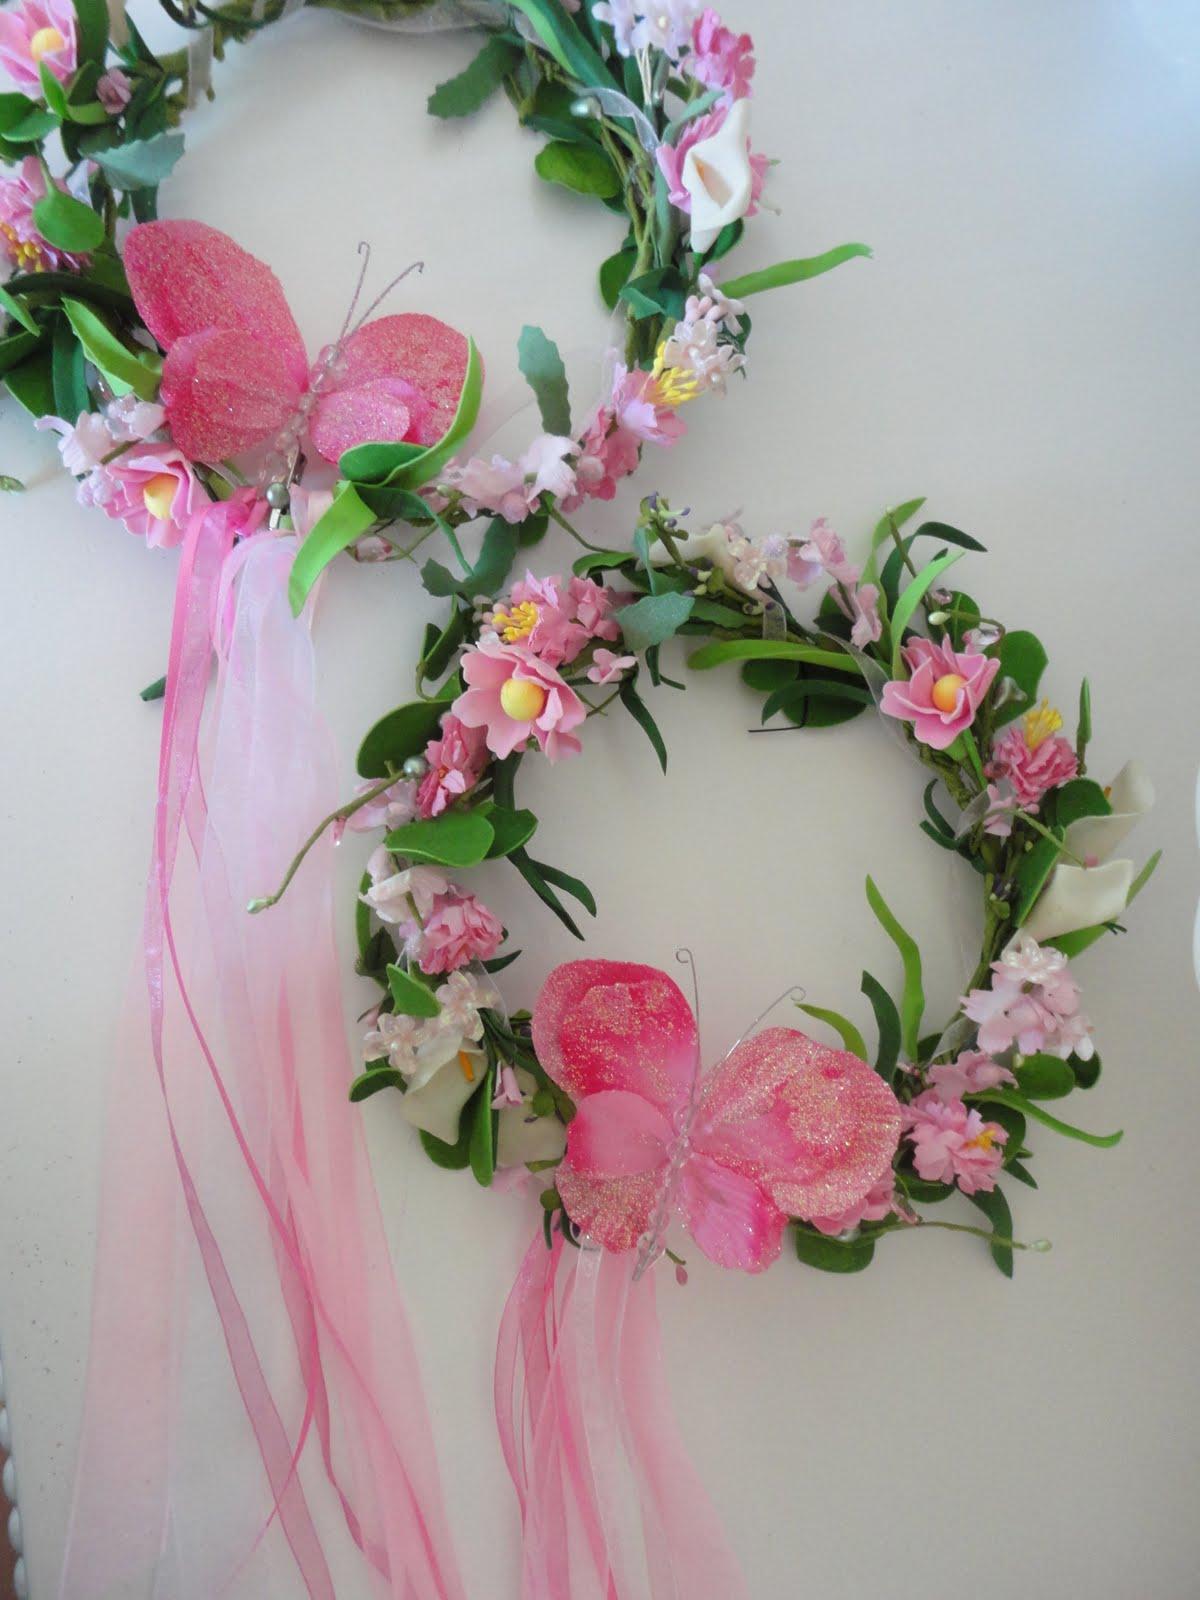 http://2.bp.blogspot.com/-6r7HBDgGFFA/Ti4v3I3rE0I/AAAAAAAAAnU/FwNGA9Ina64/s1600/crowns.JPG